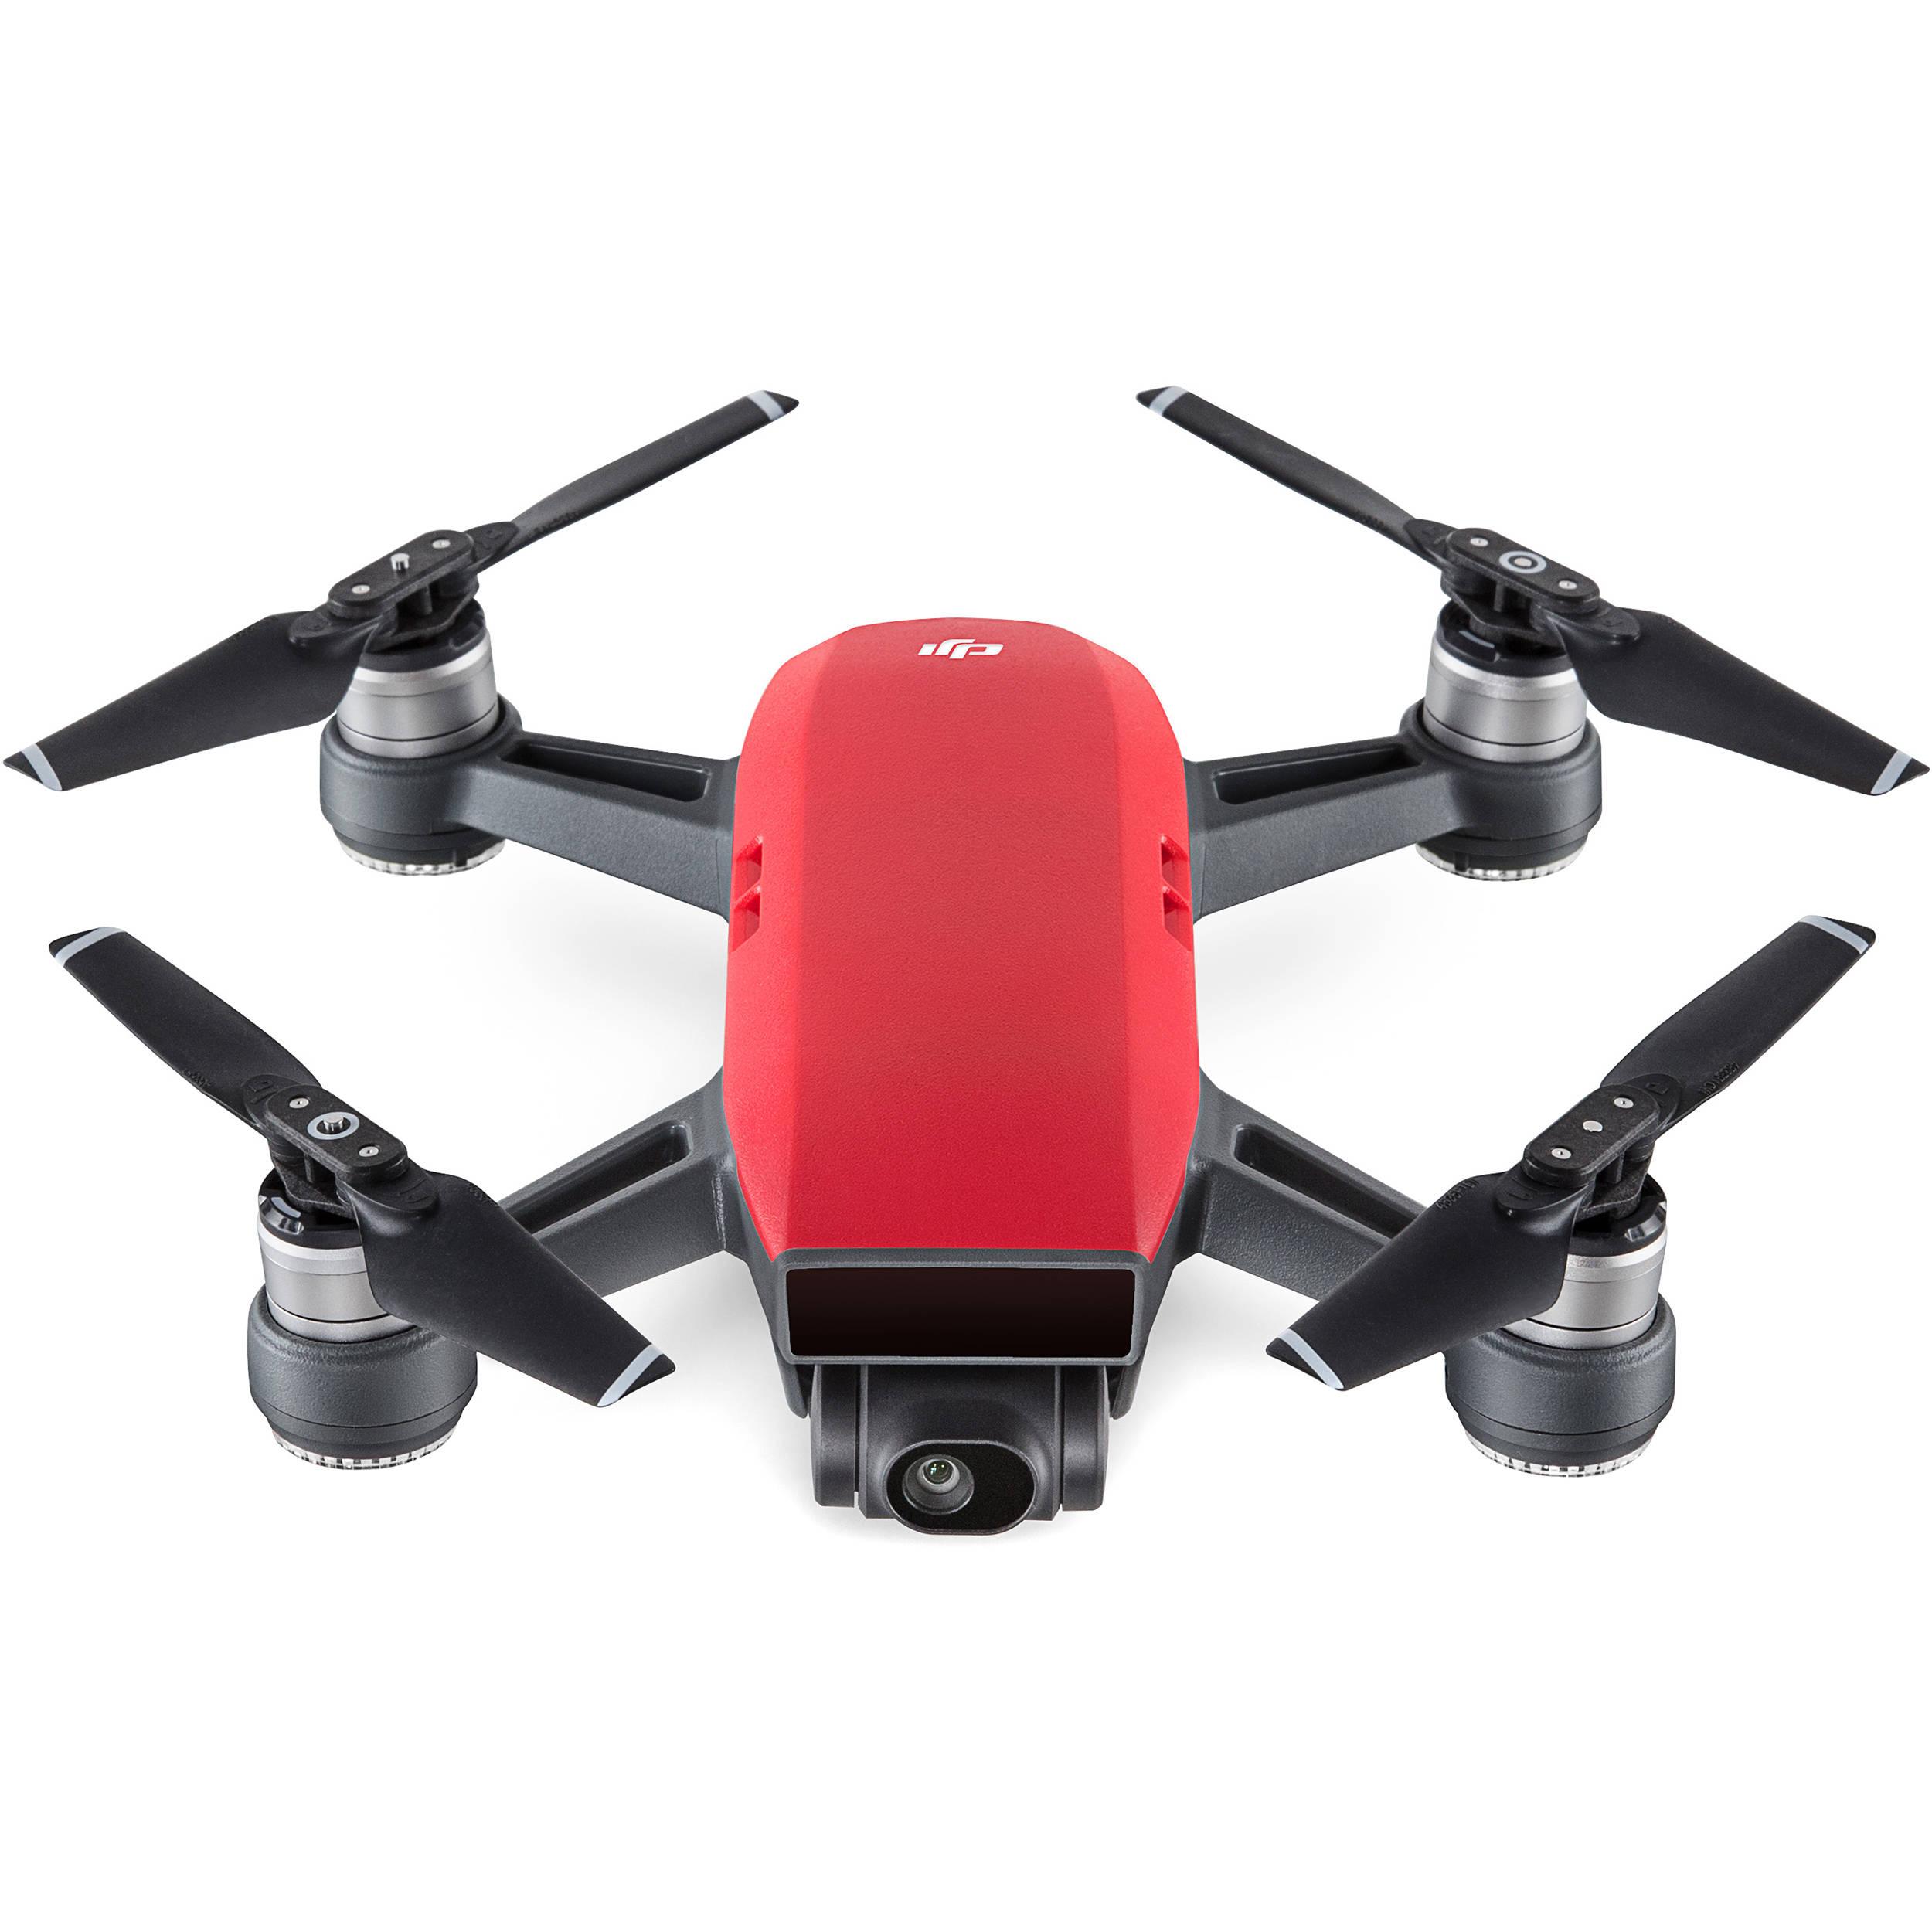 DJI Spark drone £276.17@ AmazonDE